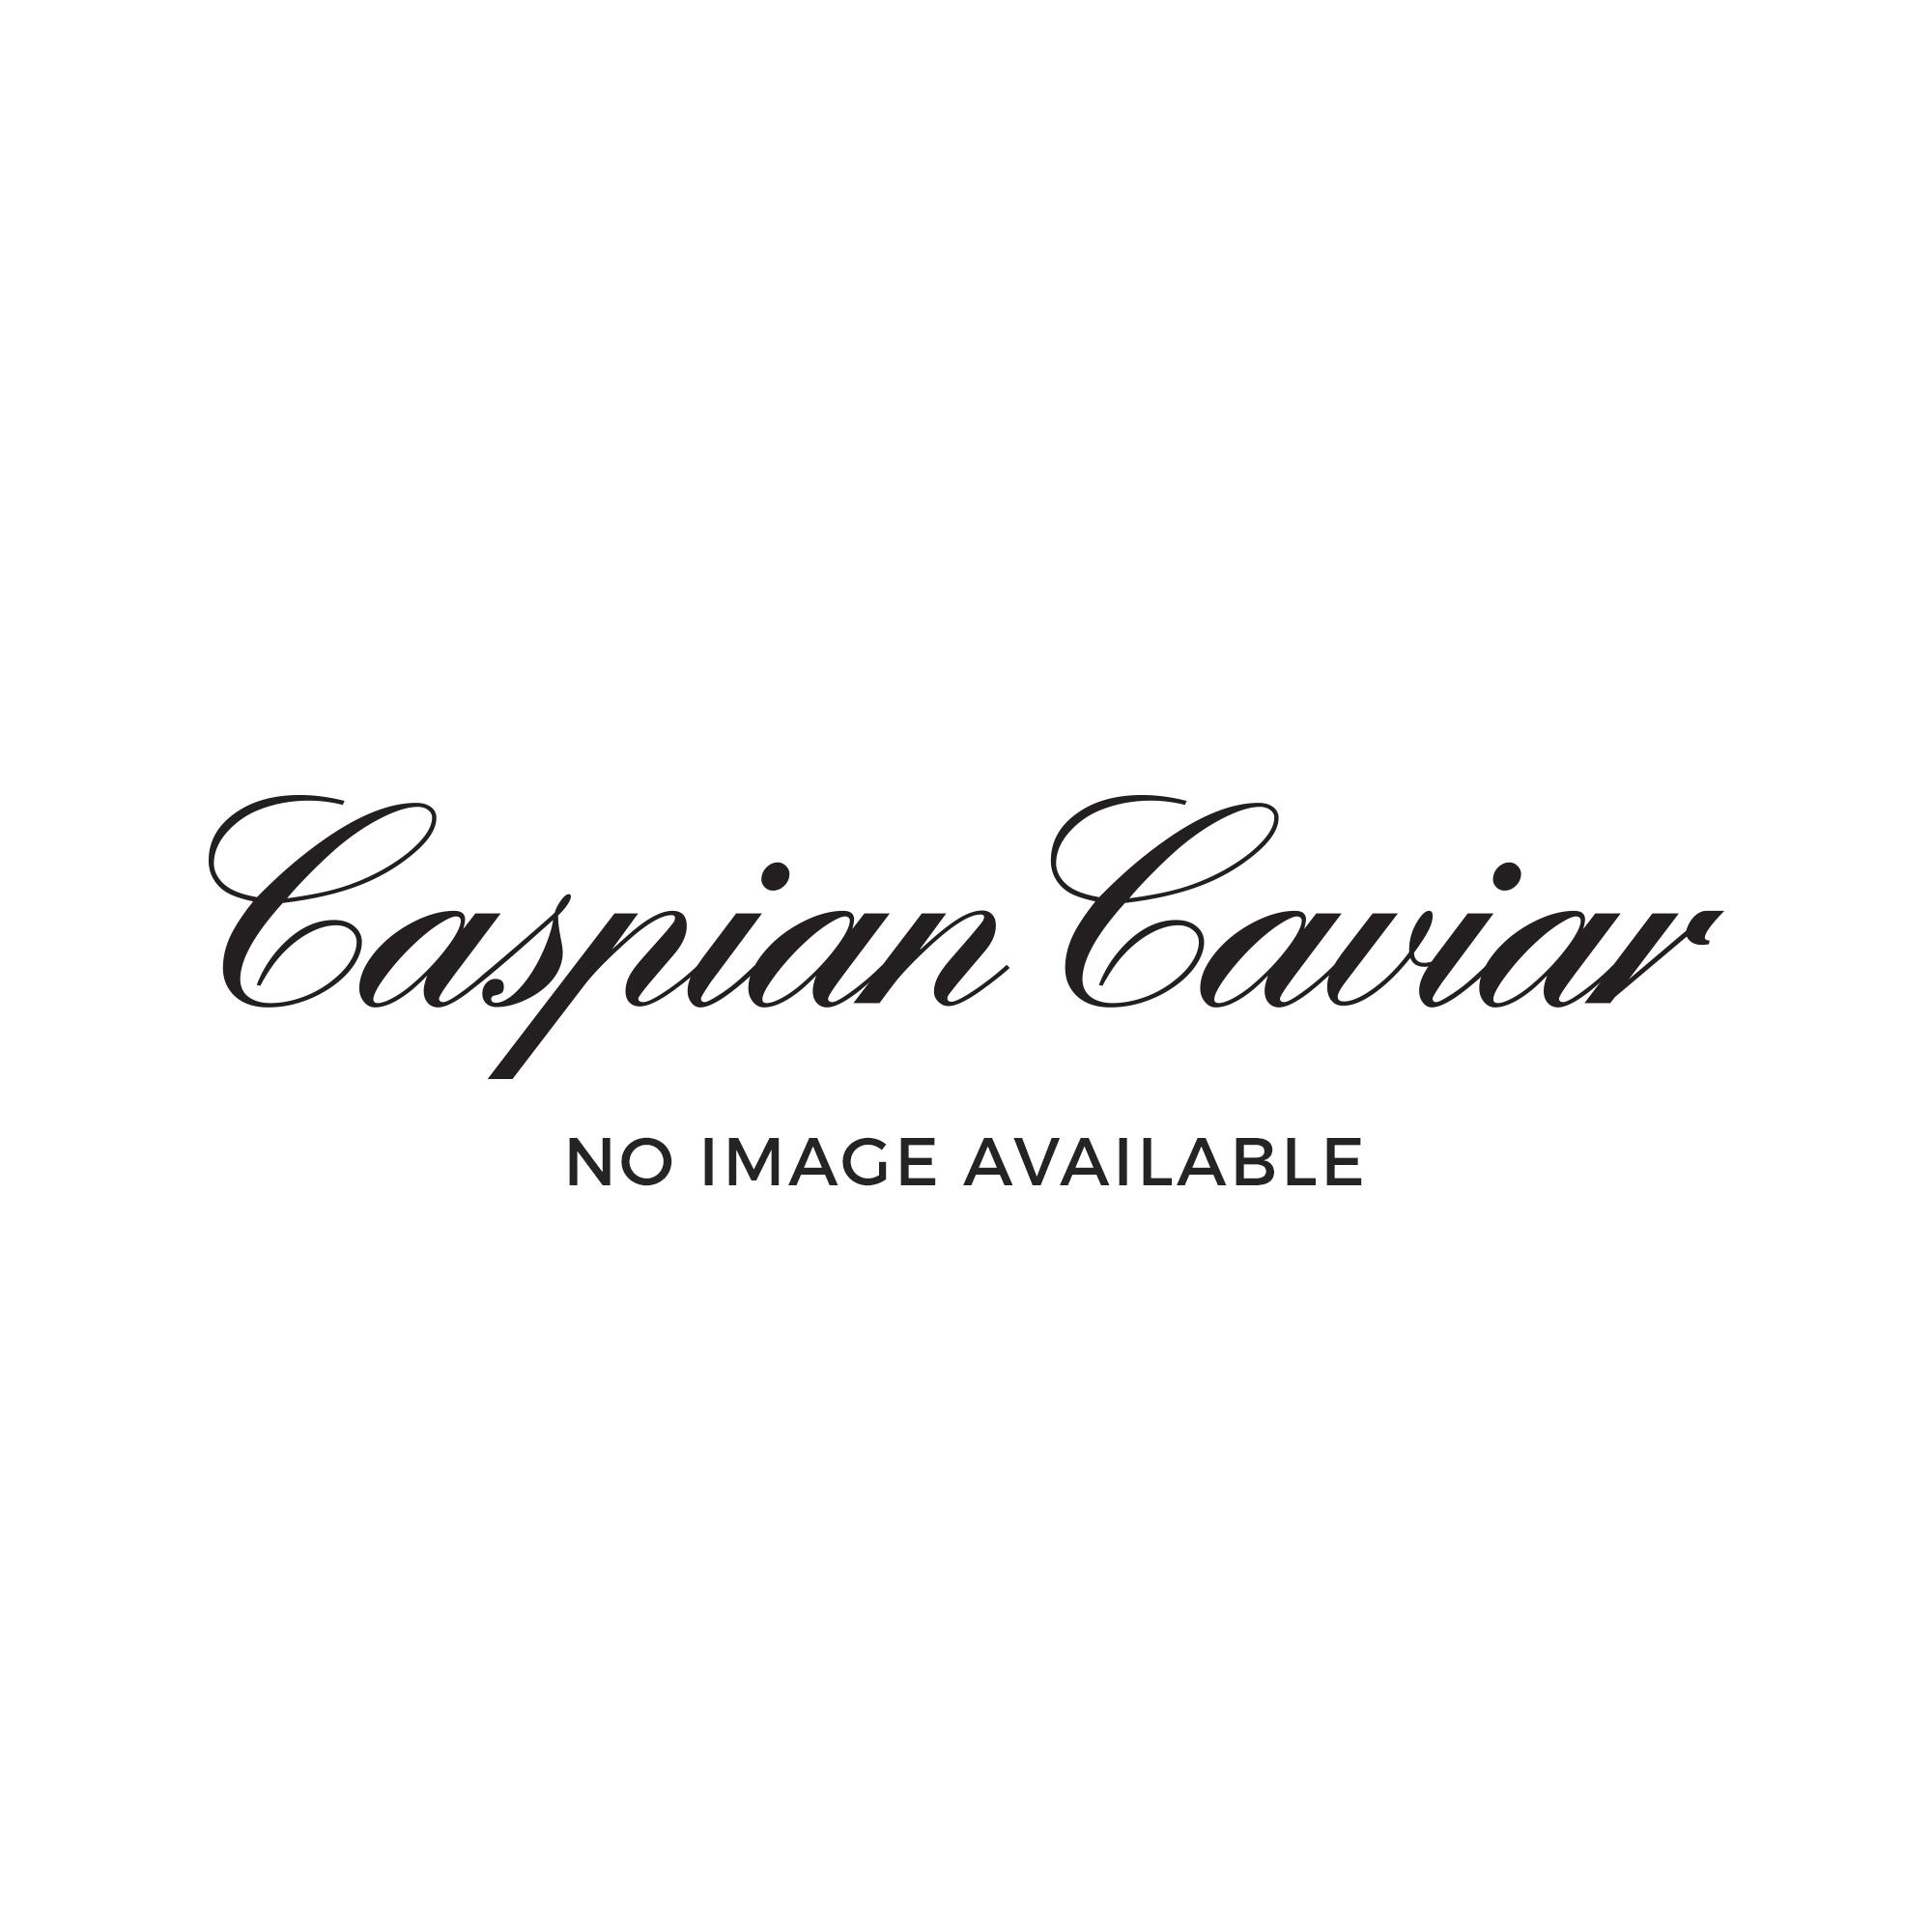 Caspian Caviar House Champagne 70cl